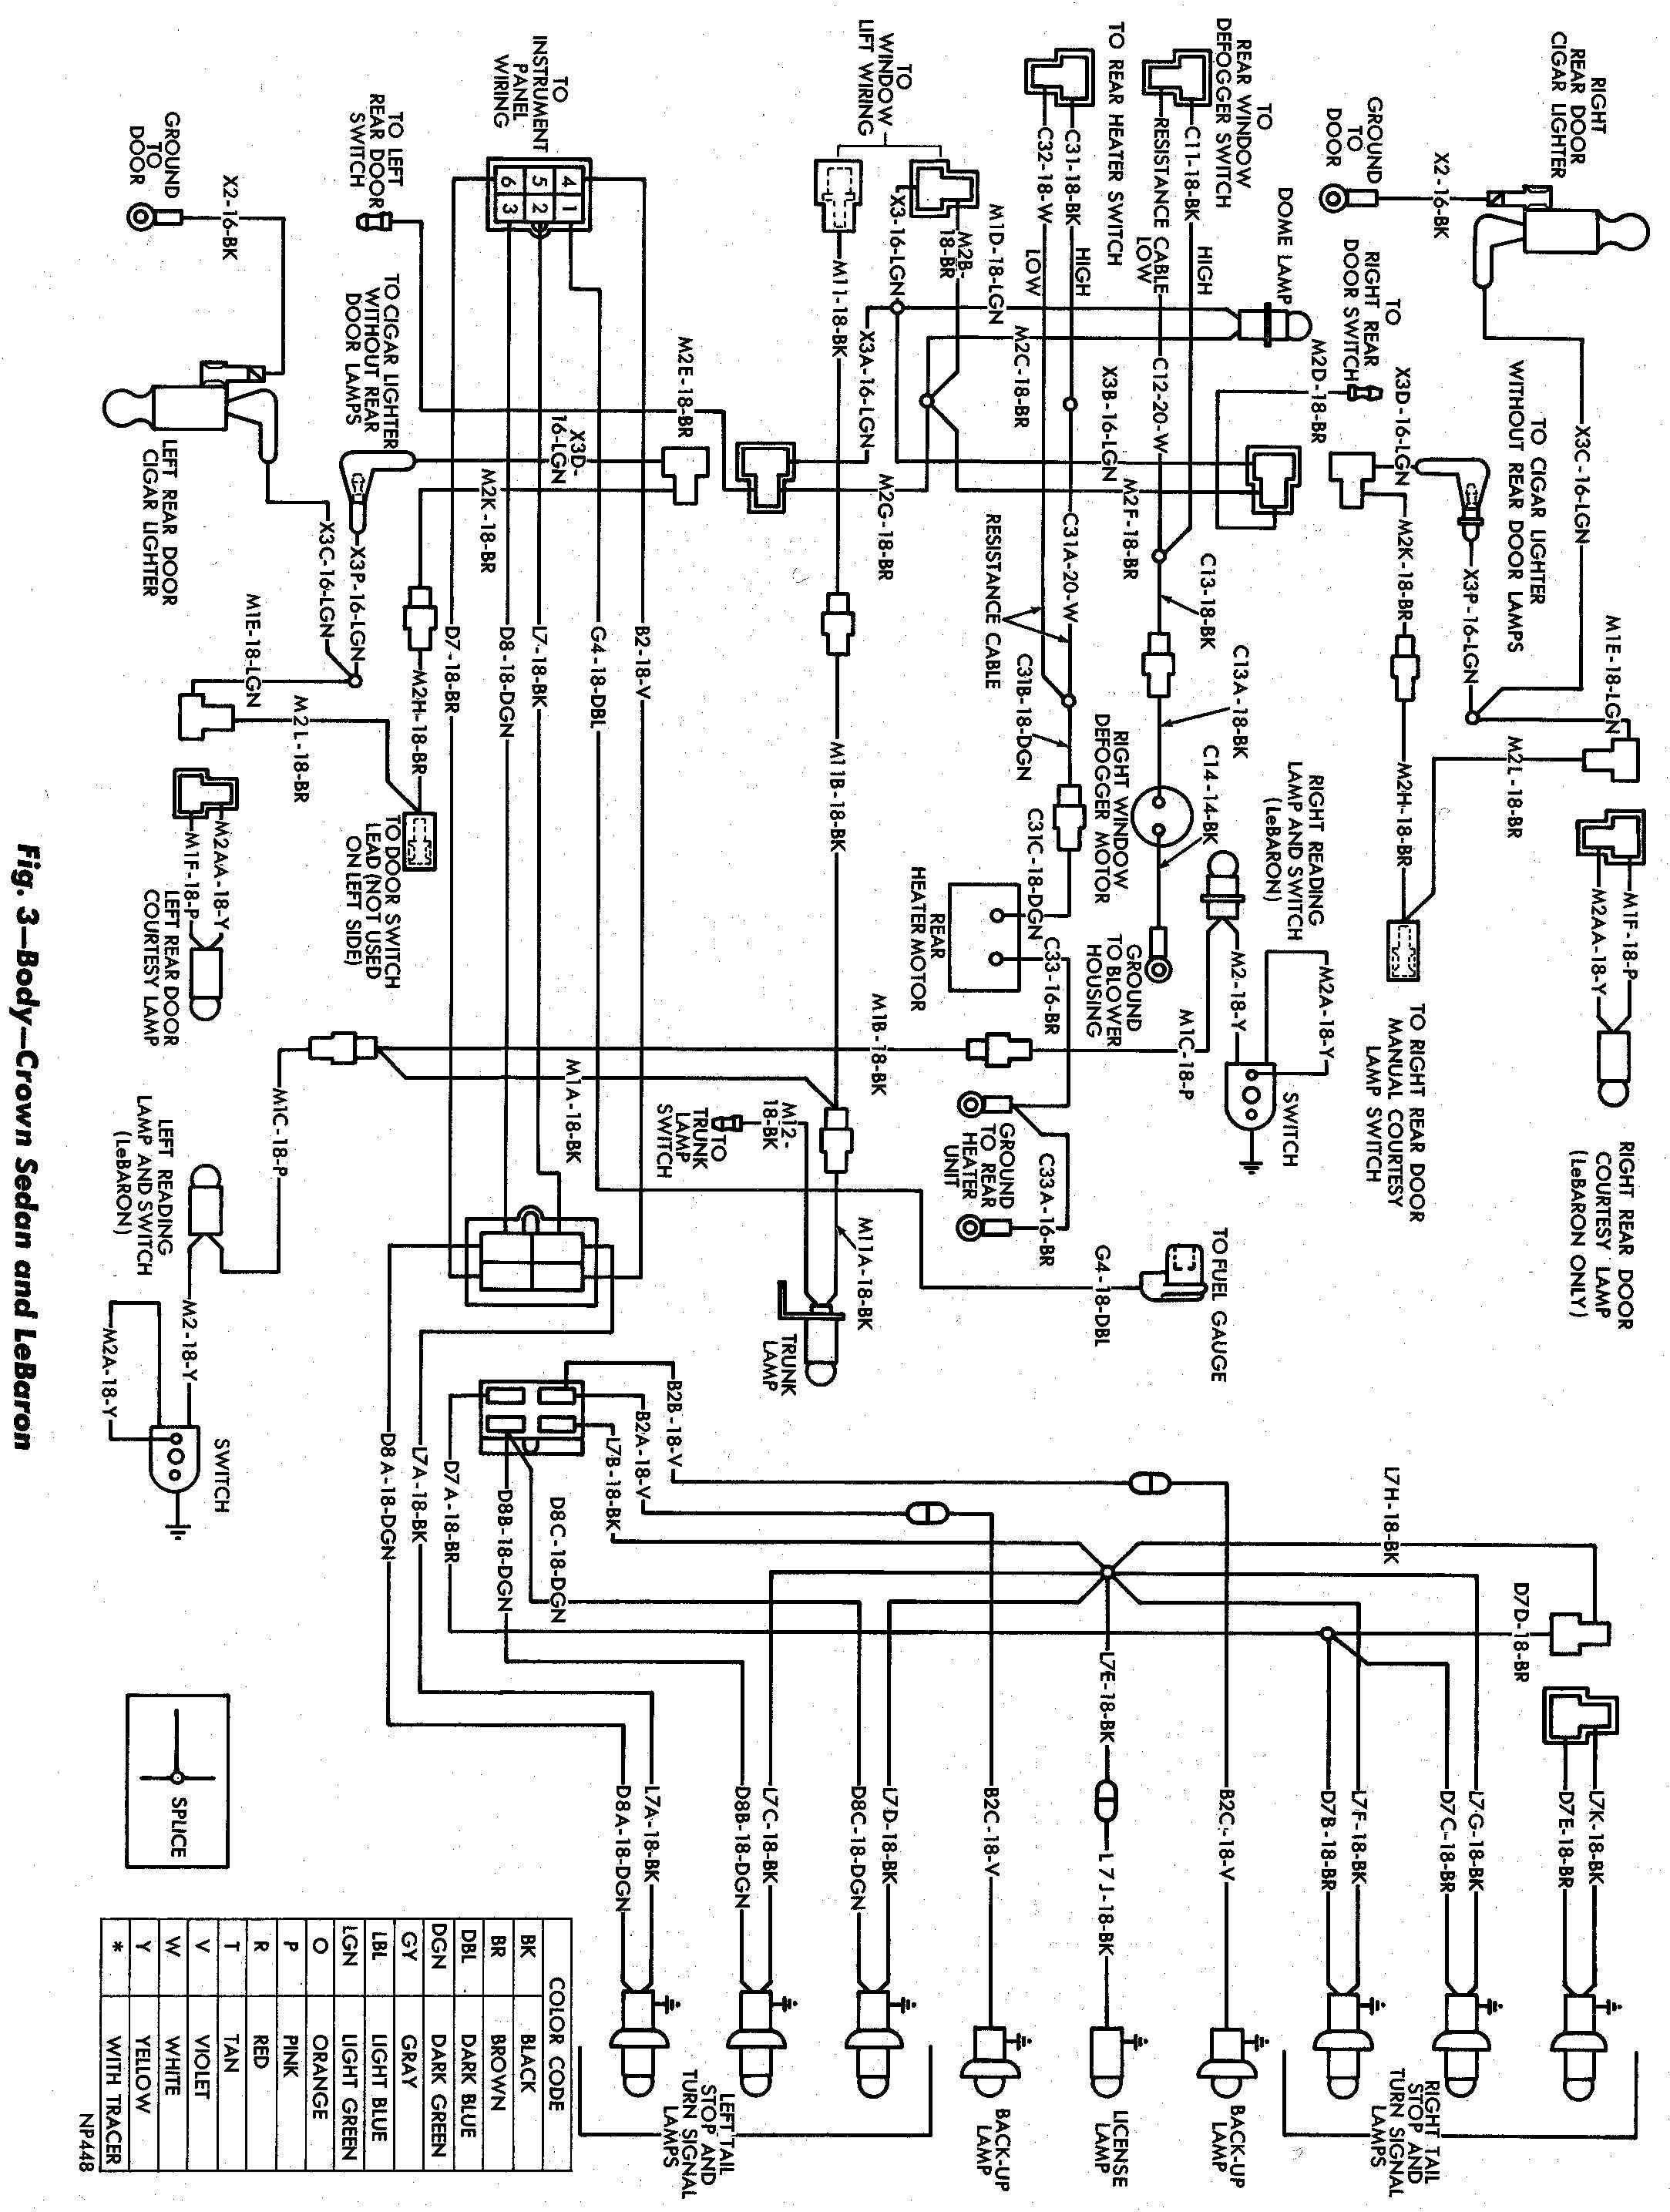 1967 chevelle ss wiring diagram schematic on 1867  1970 chevelle wiring harness wiring diagram  1970 chevelle wiring harness wiring diagram